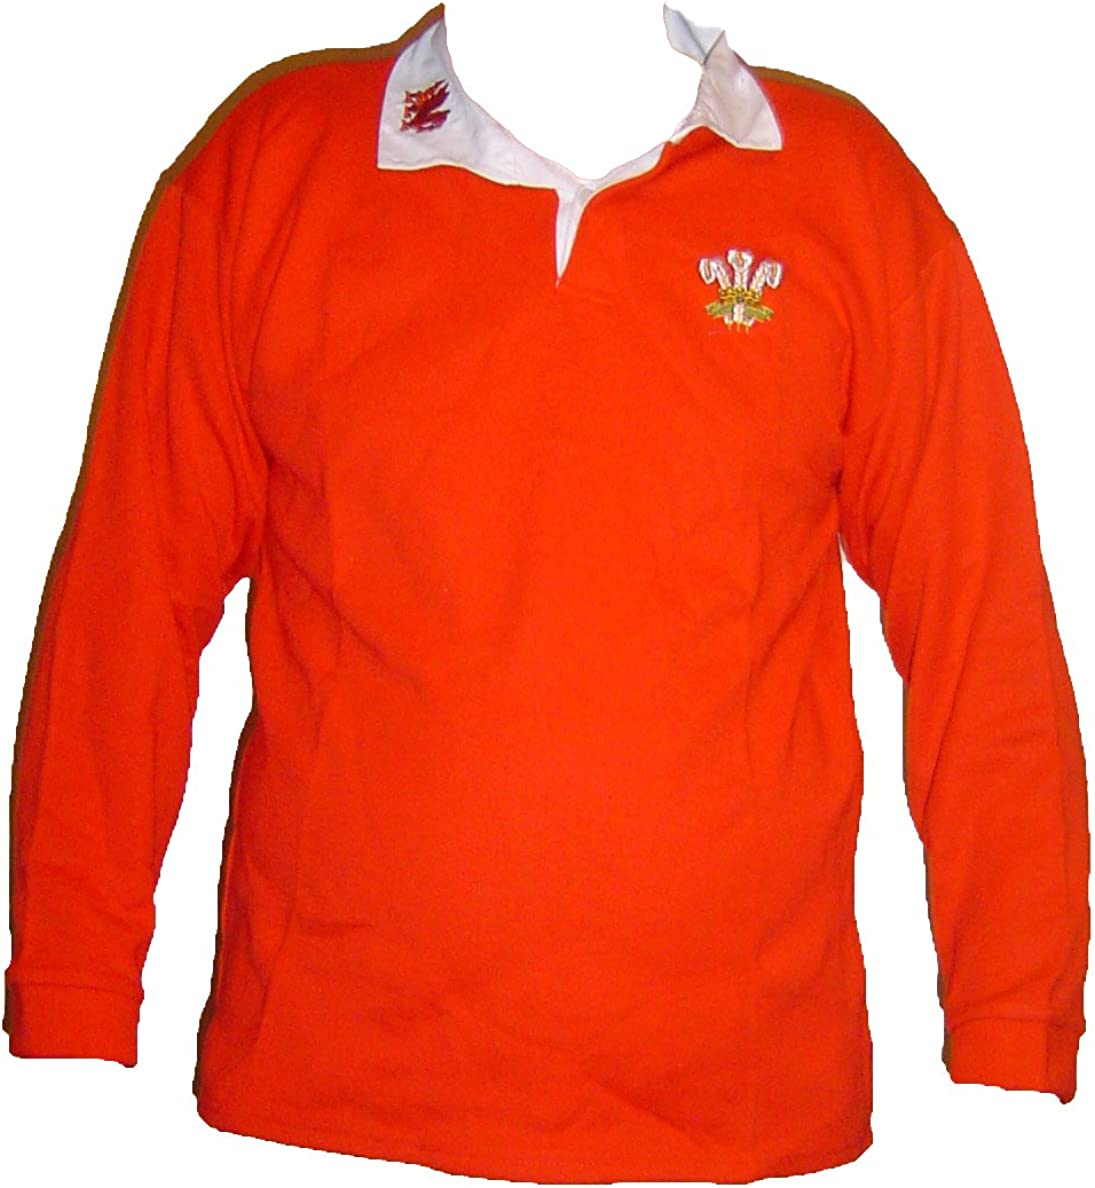 Rugby Gales - Camisas de Gimnasia Retro galesa, Unisex, para ...